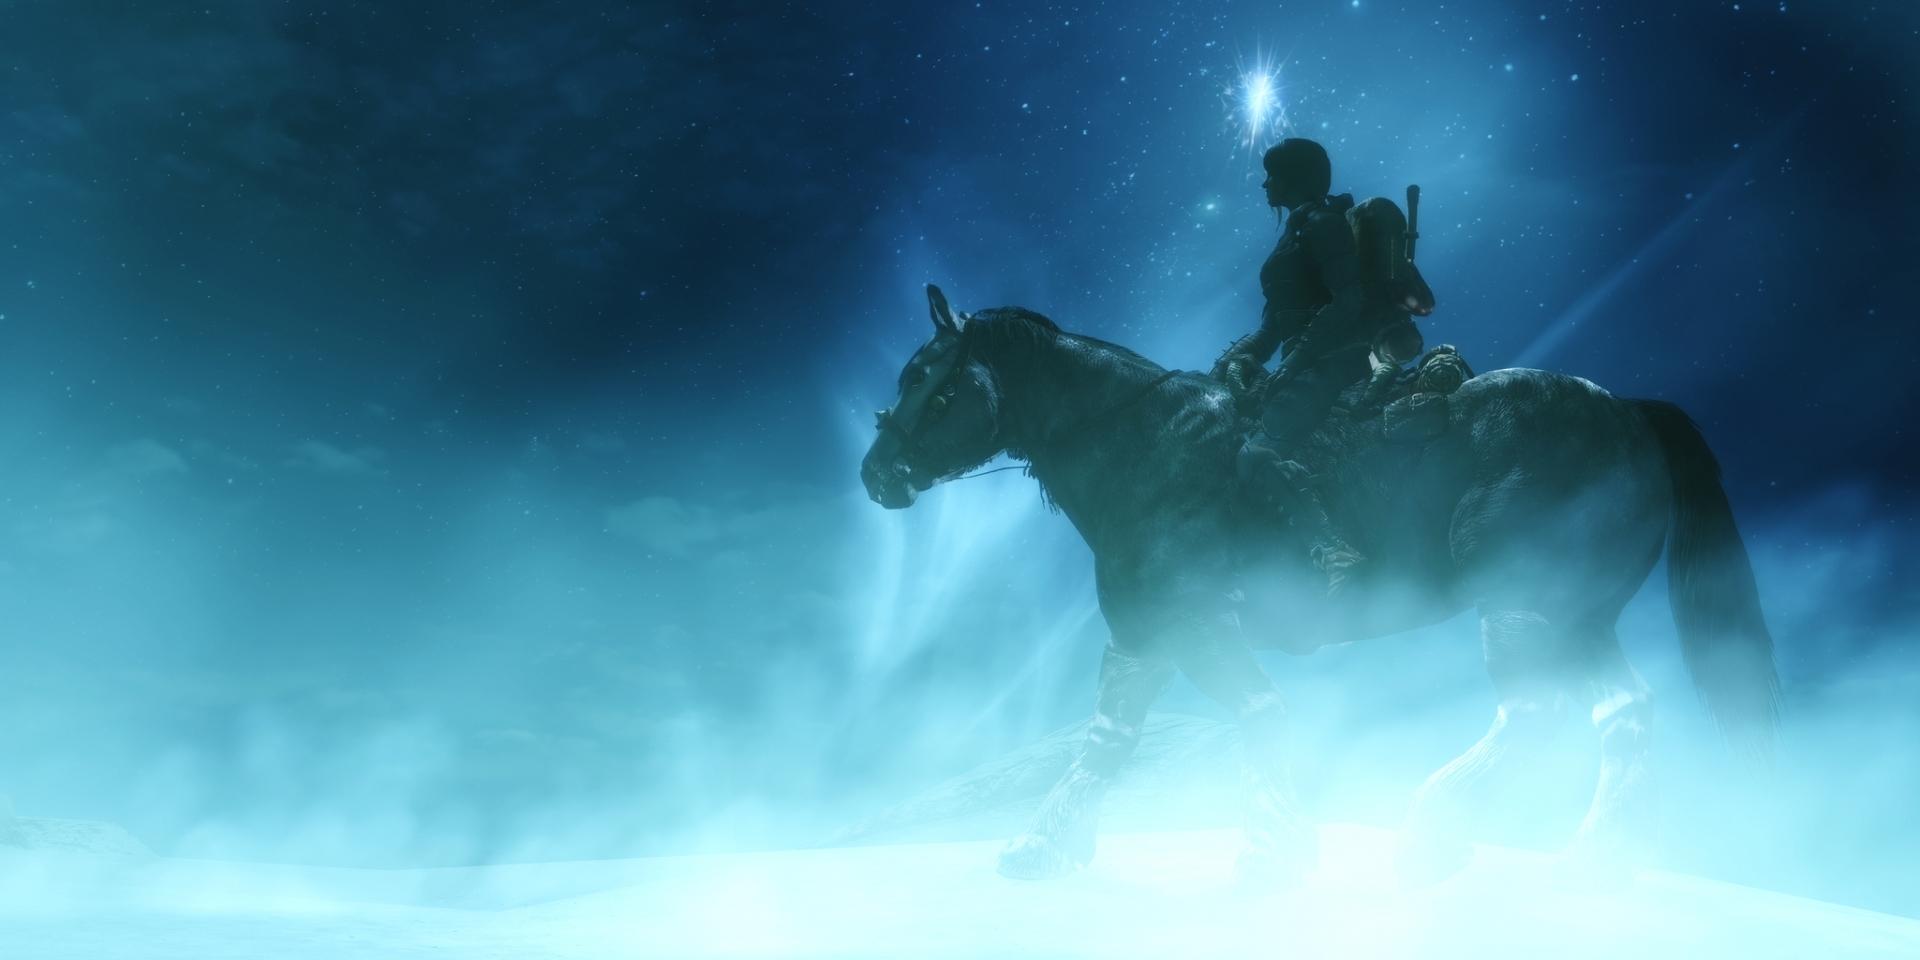 Арт к игре The Elder Scrolls V: Skyrim